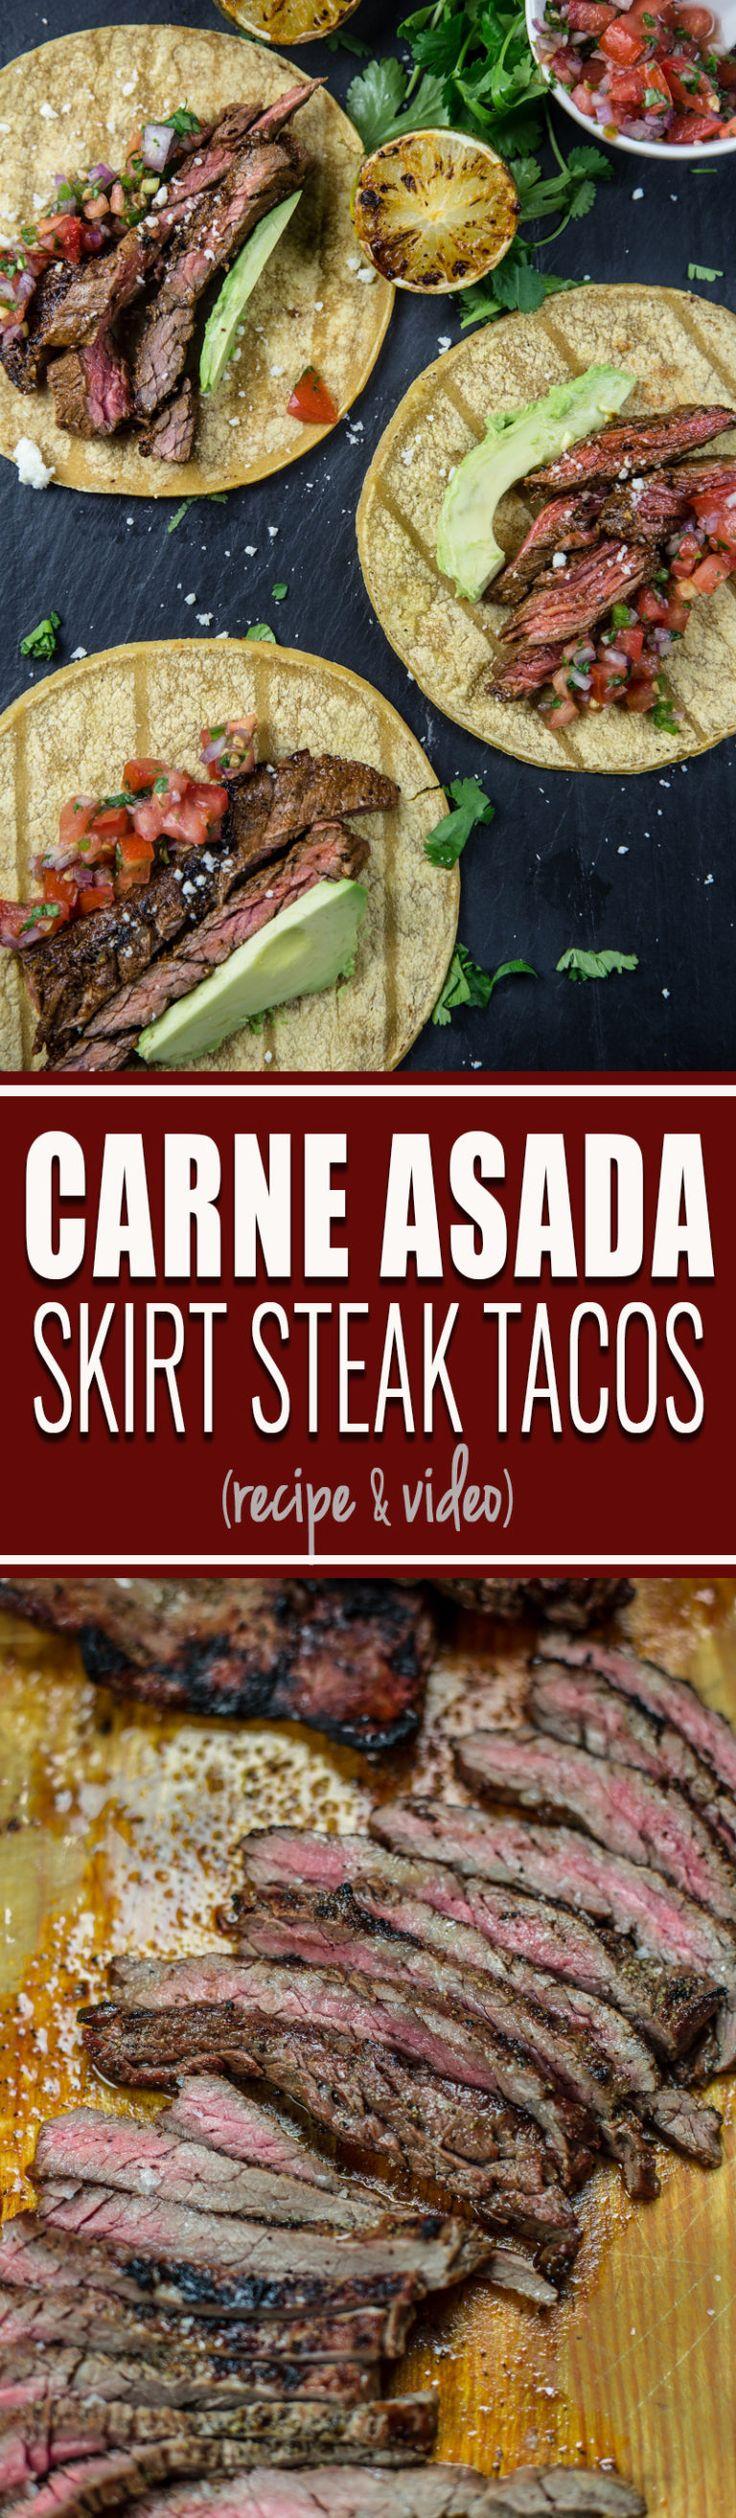 Carne Asada (Marinated Grilled Skirt Steak Tacos)